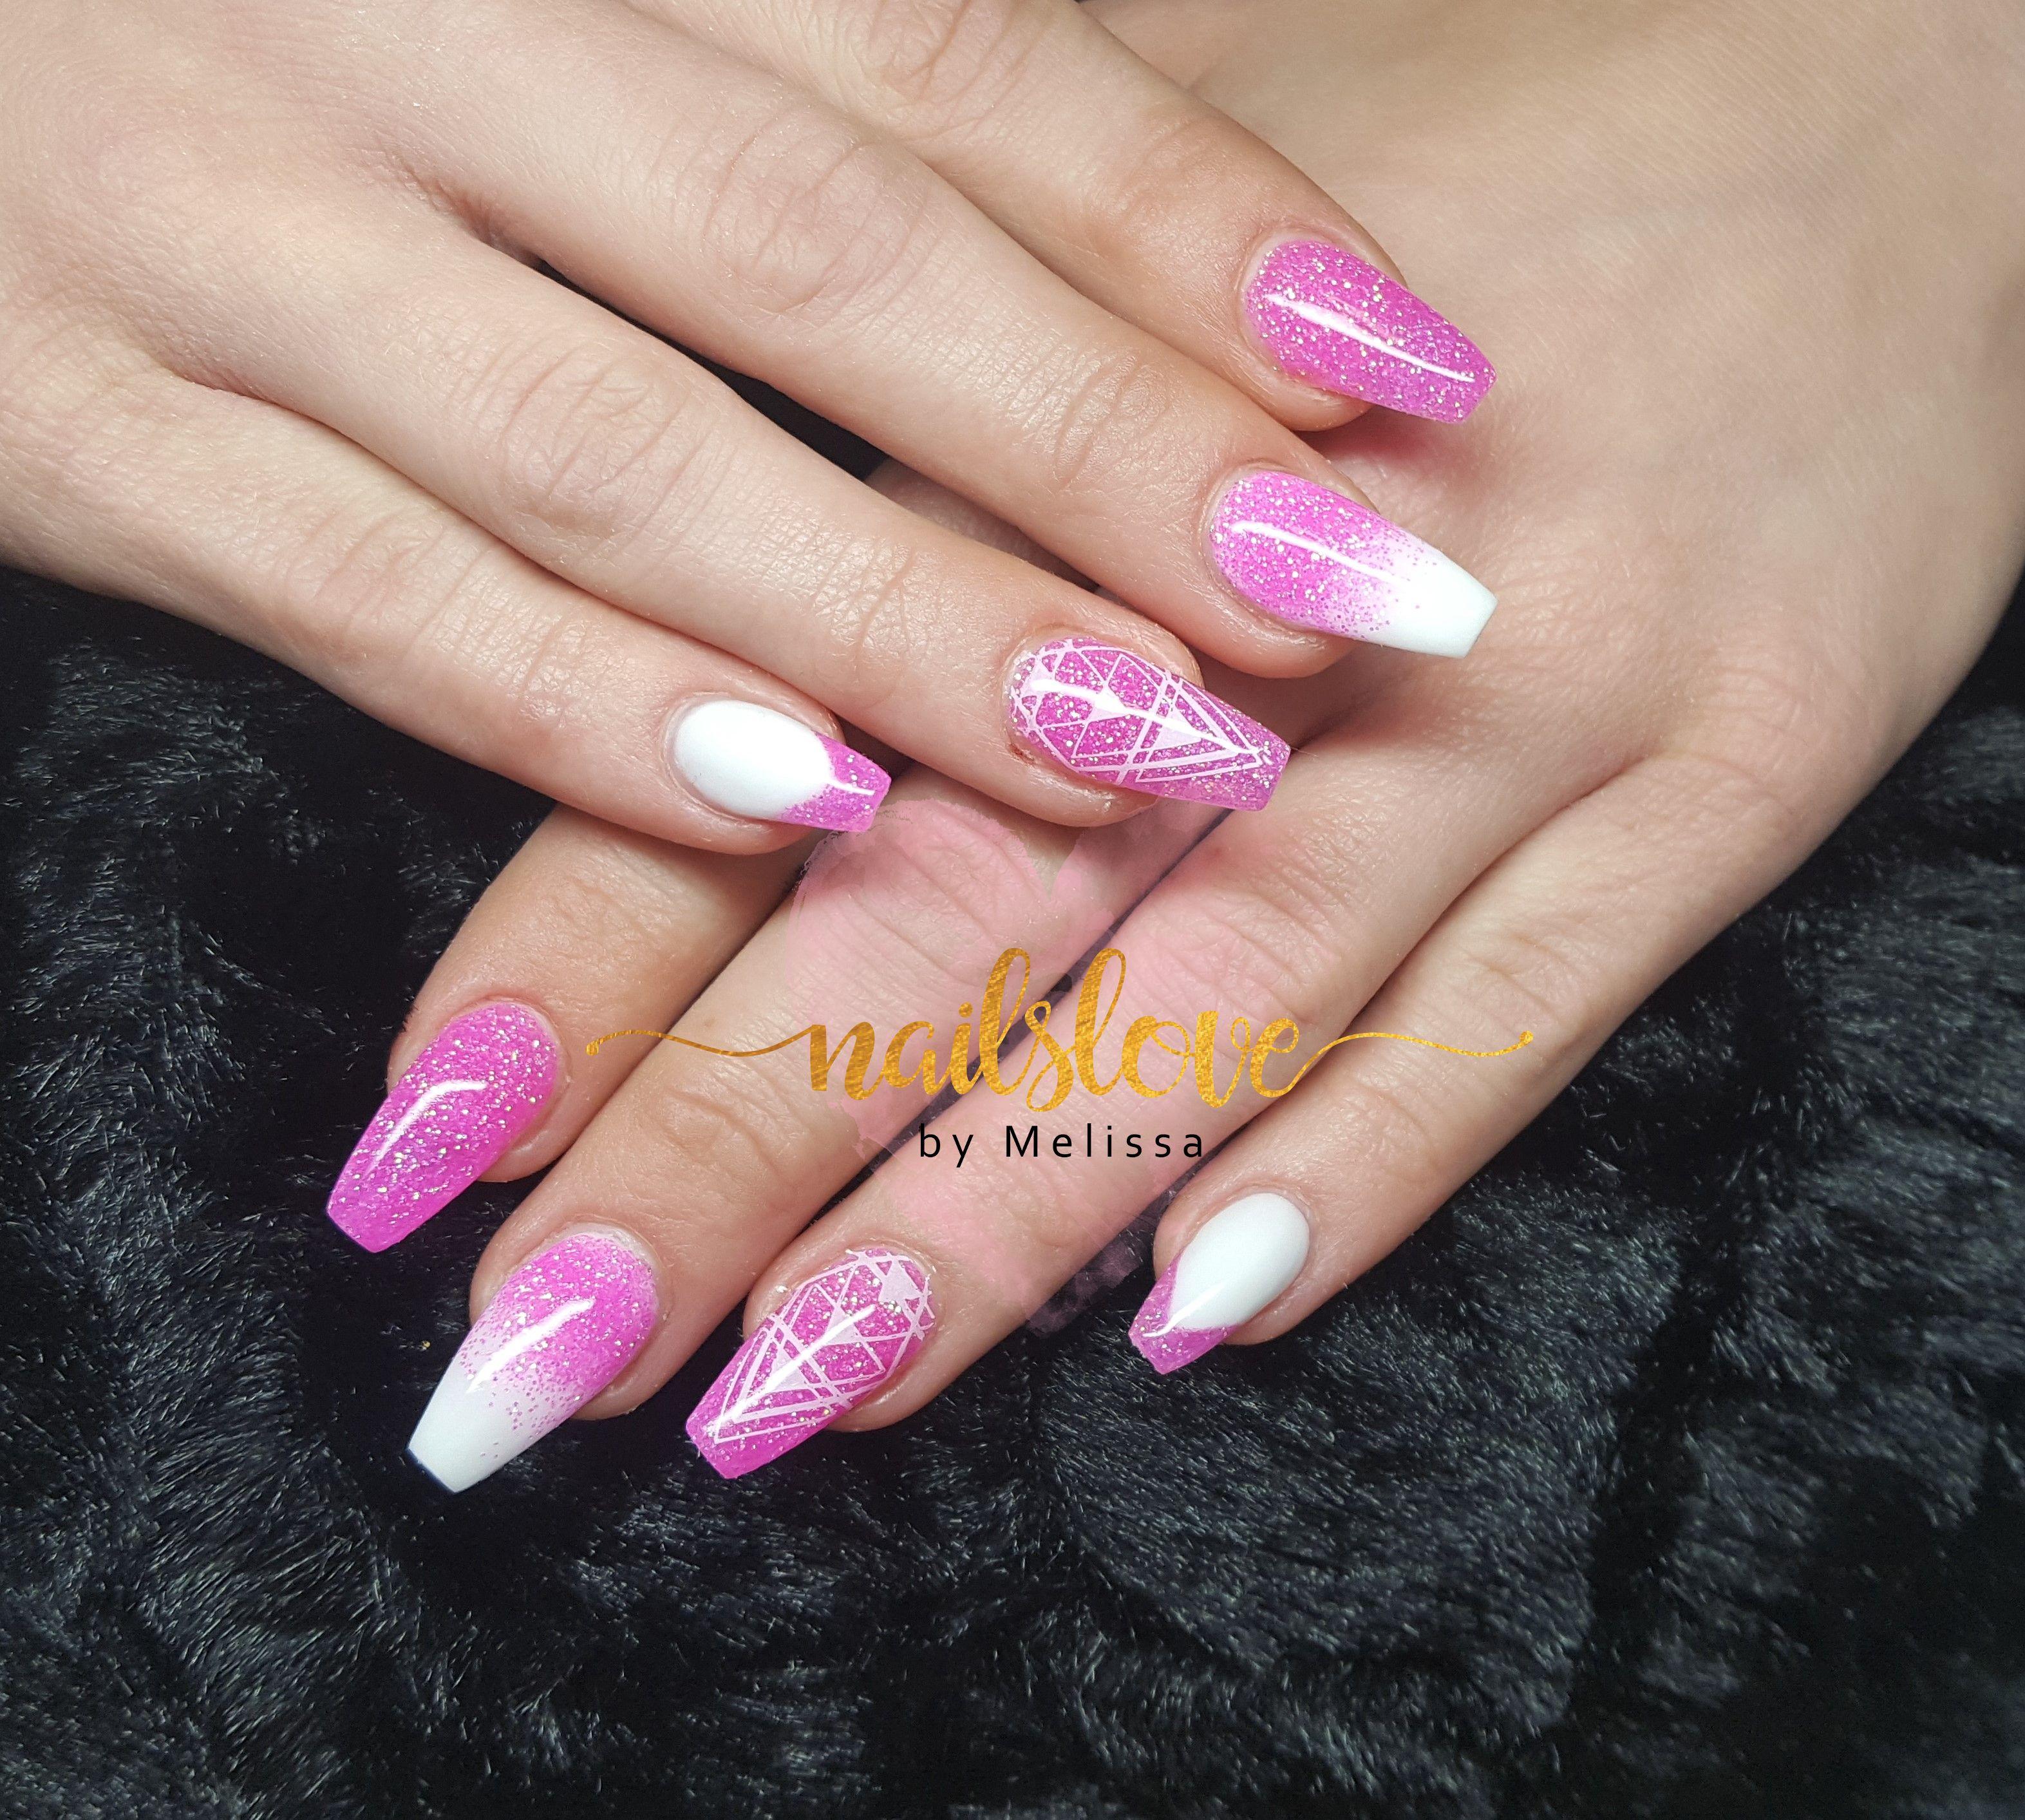 Ballerinanails acrylicnails longnails nails pink pinknails